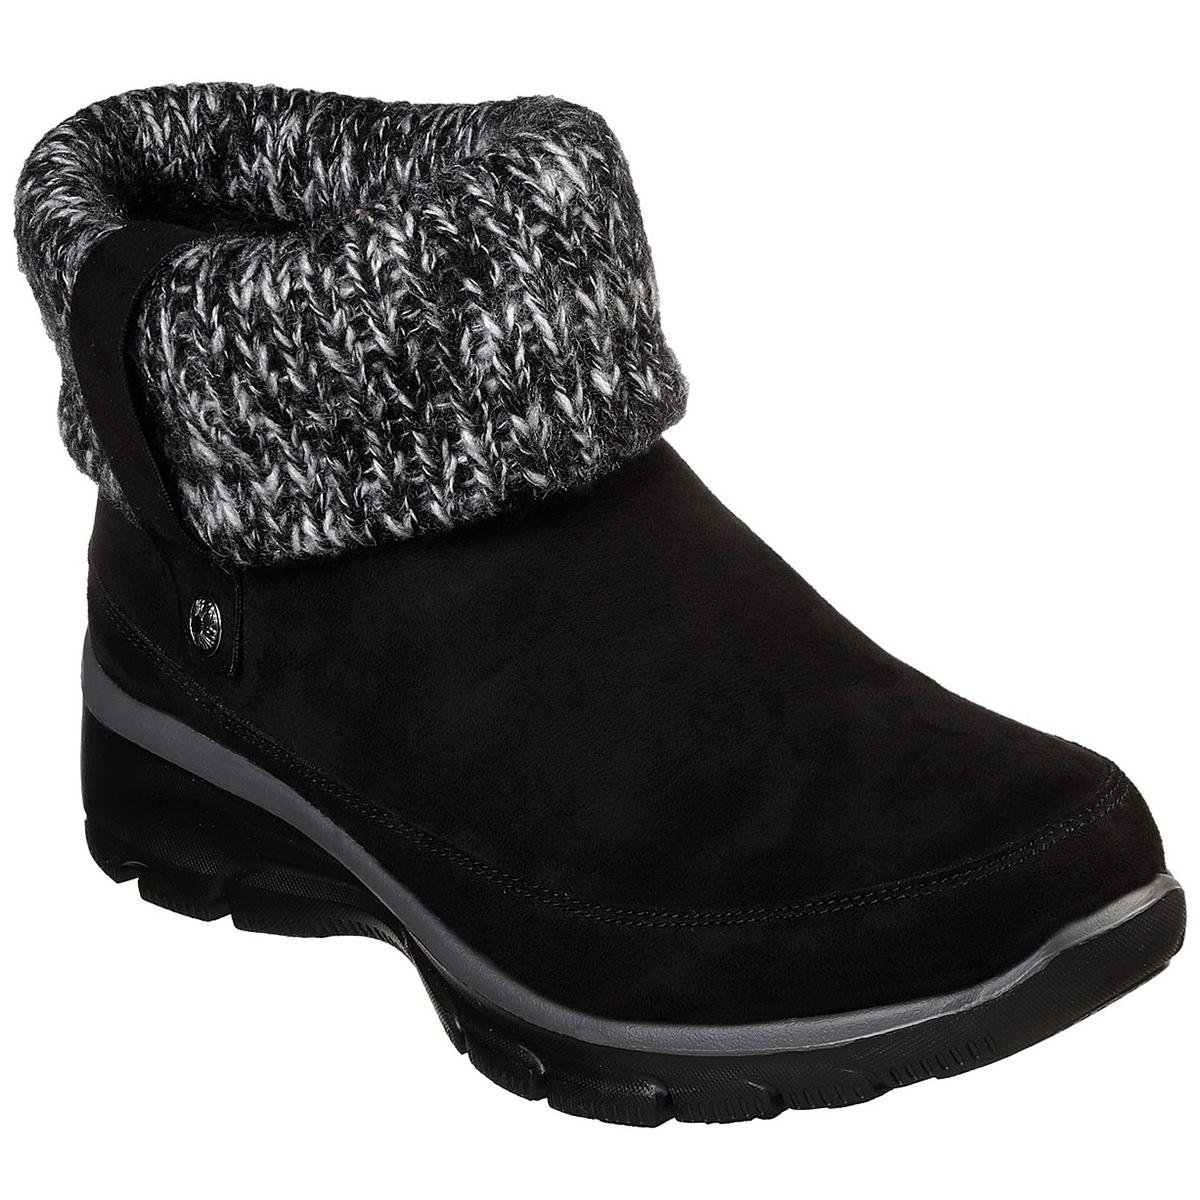 Skechers Women's Easy Going Heighten Fold Over Knit Collar Bootie - Black, 7